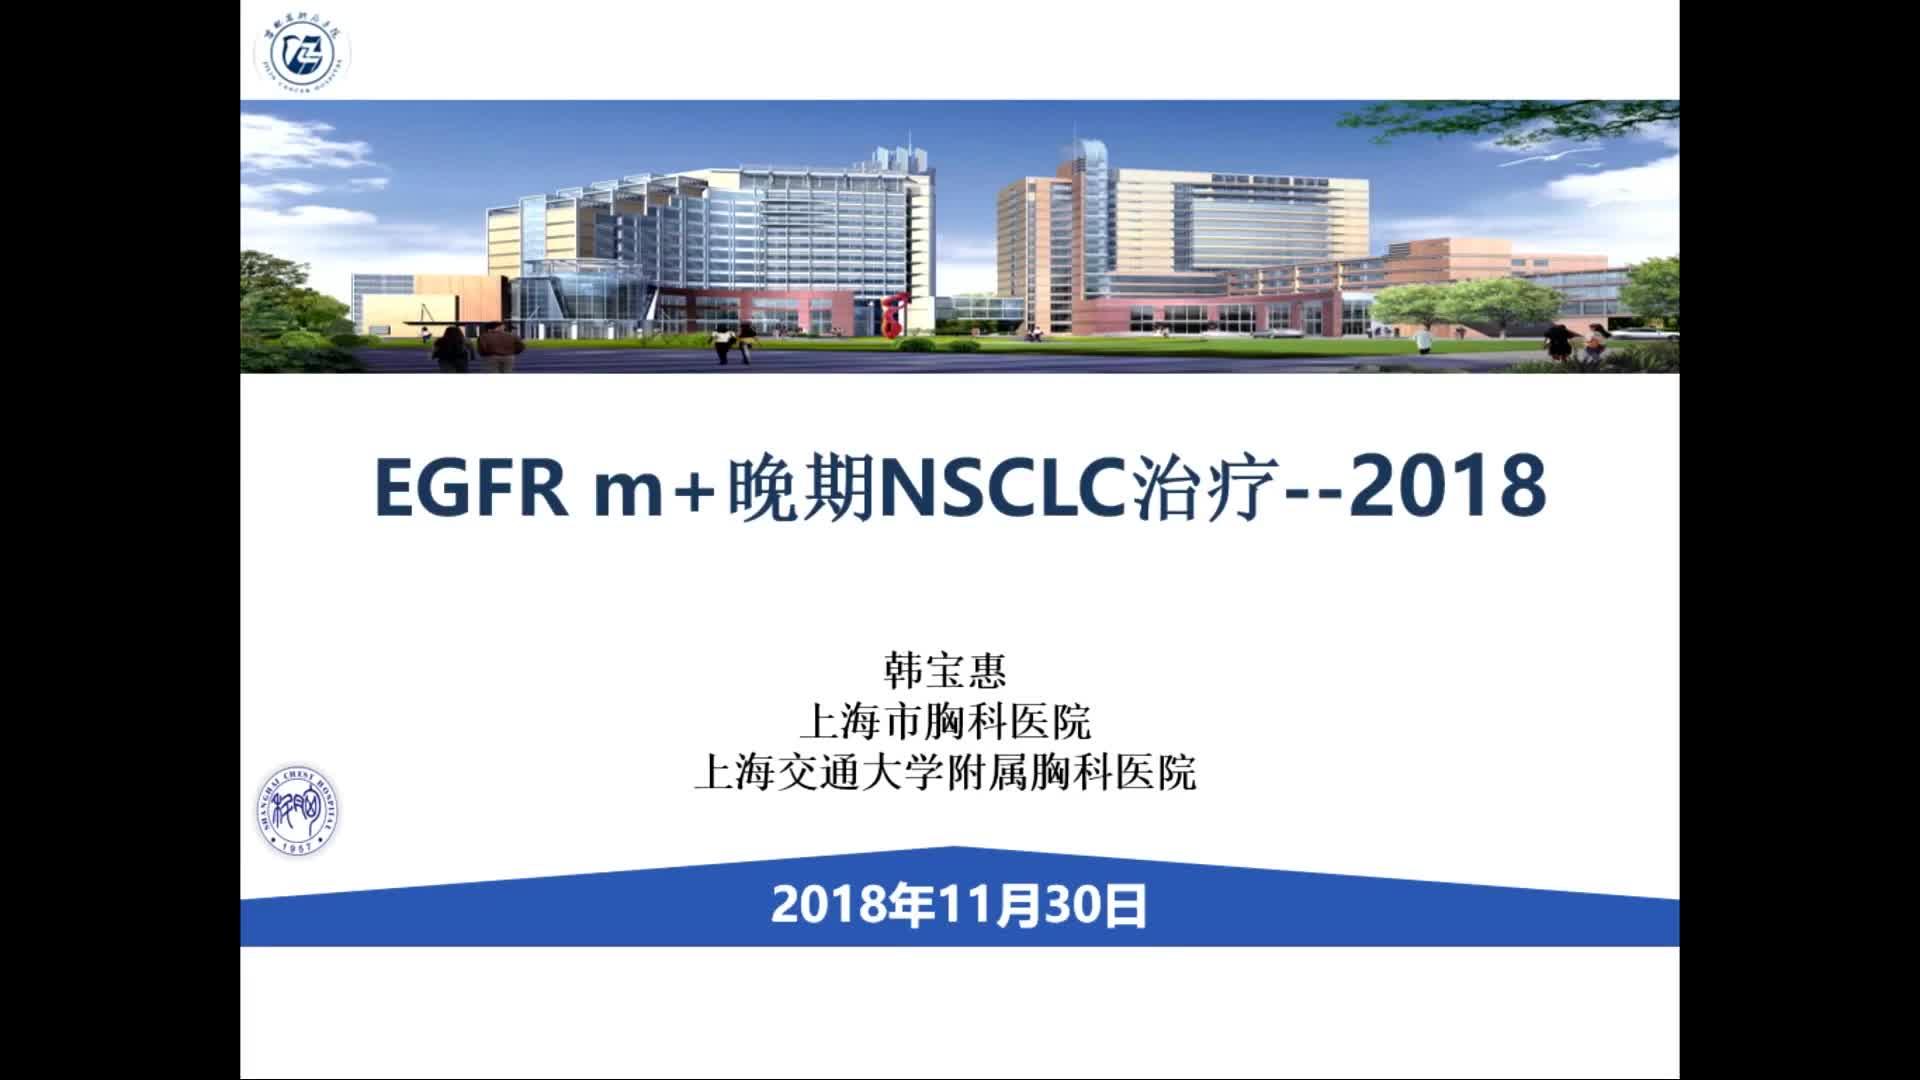 EGFR m+晚期NSCLC治疗——2018